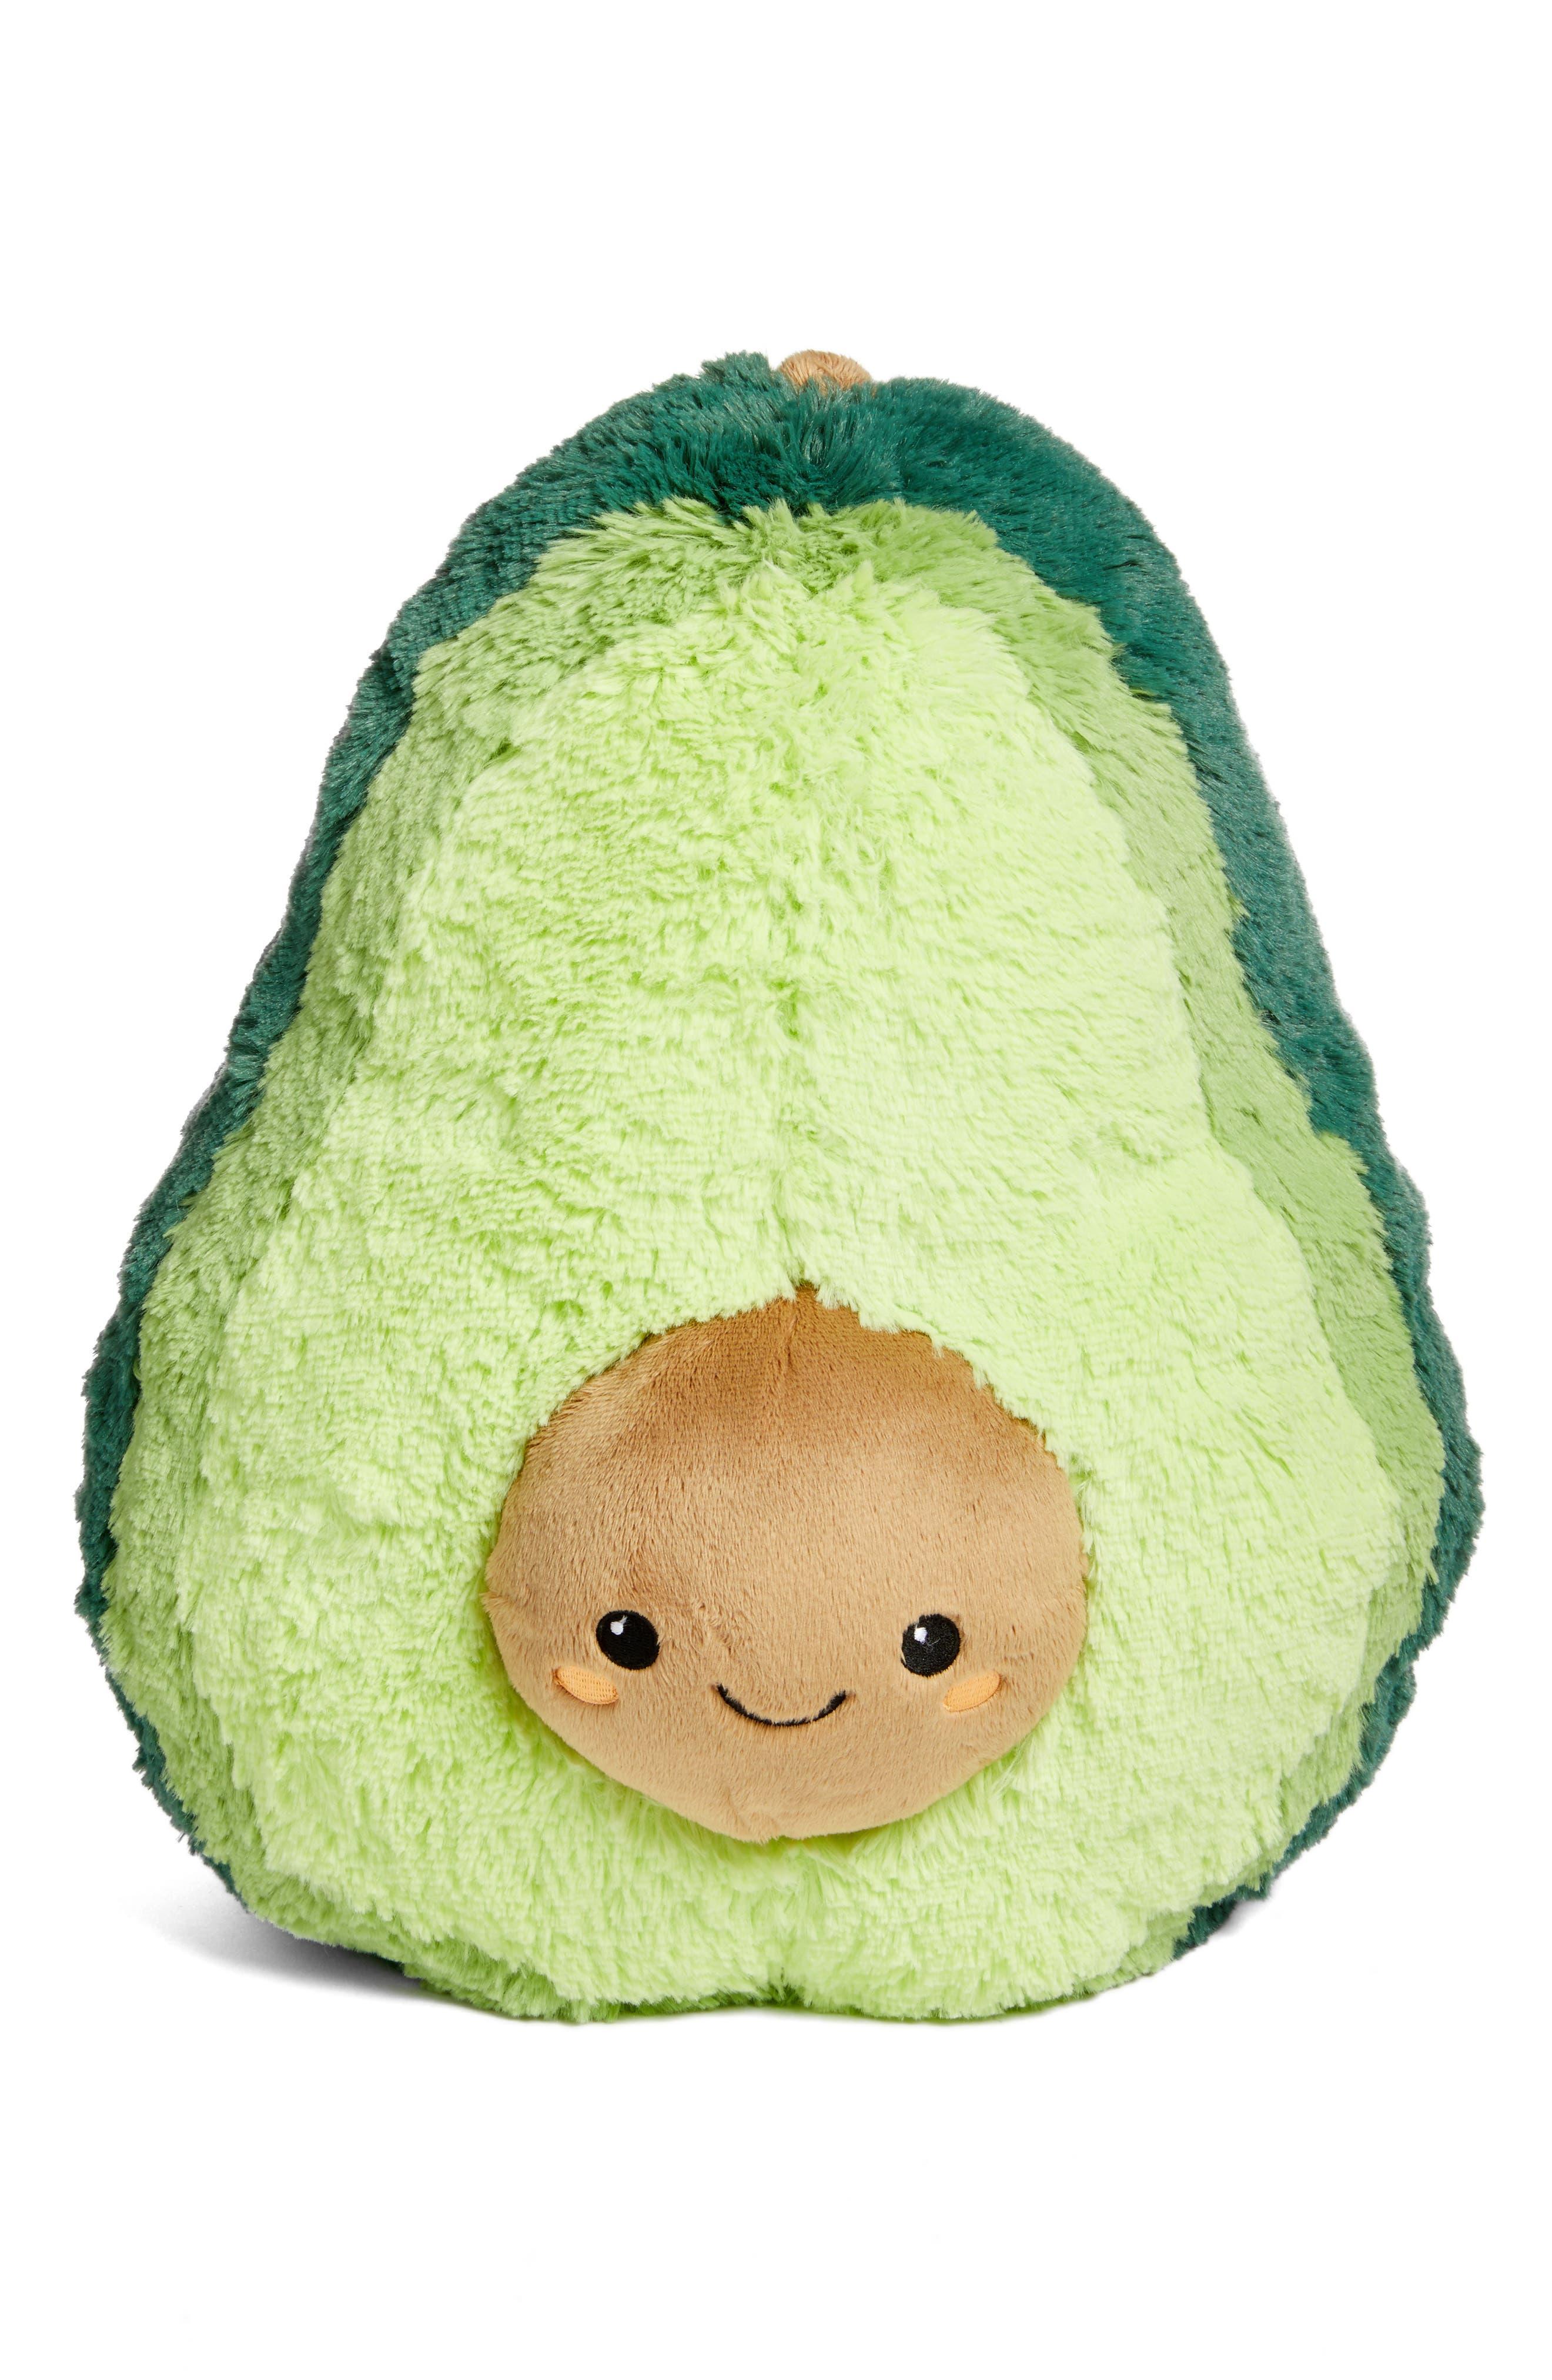 Avocado Stuffed Toy,                         Main,                         color, 300